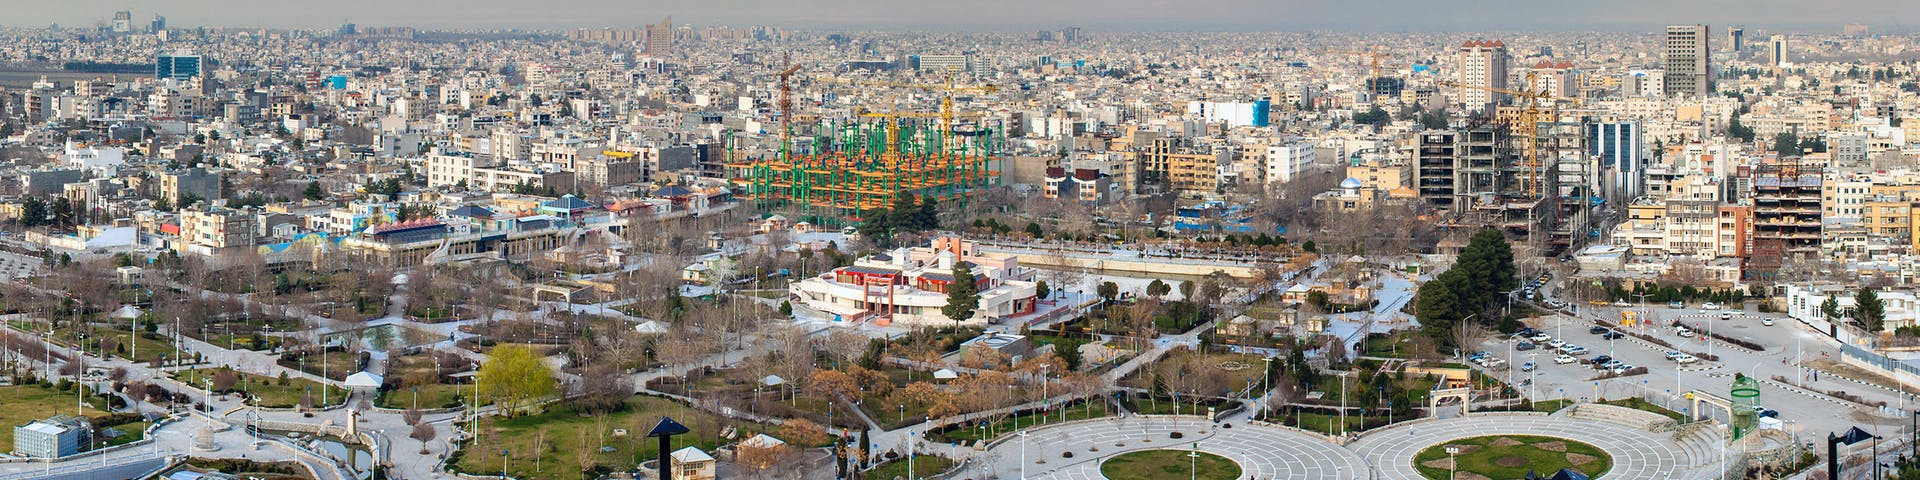 14 Top-Ranked Universities in Iran - World University